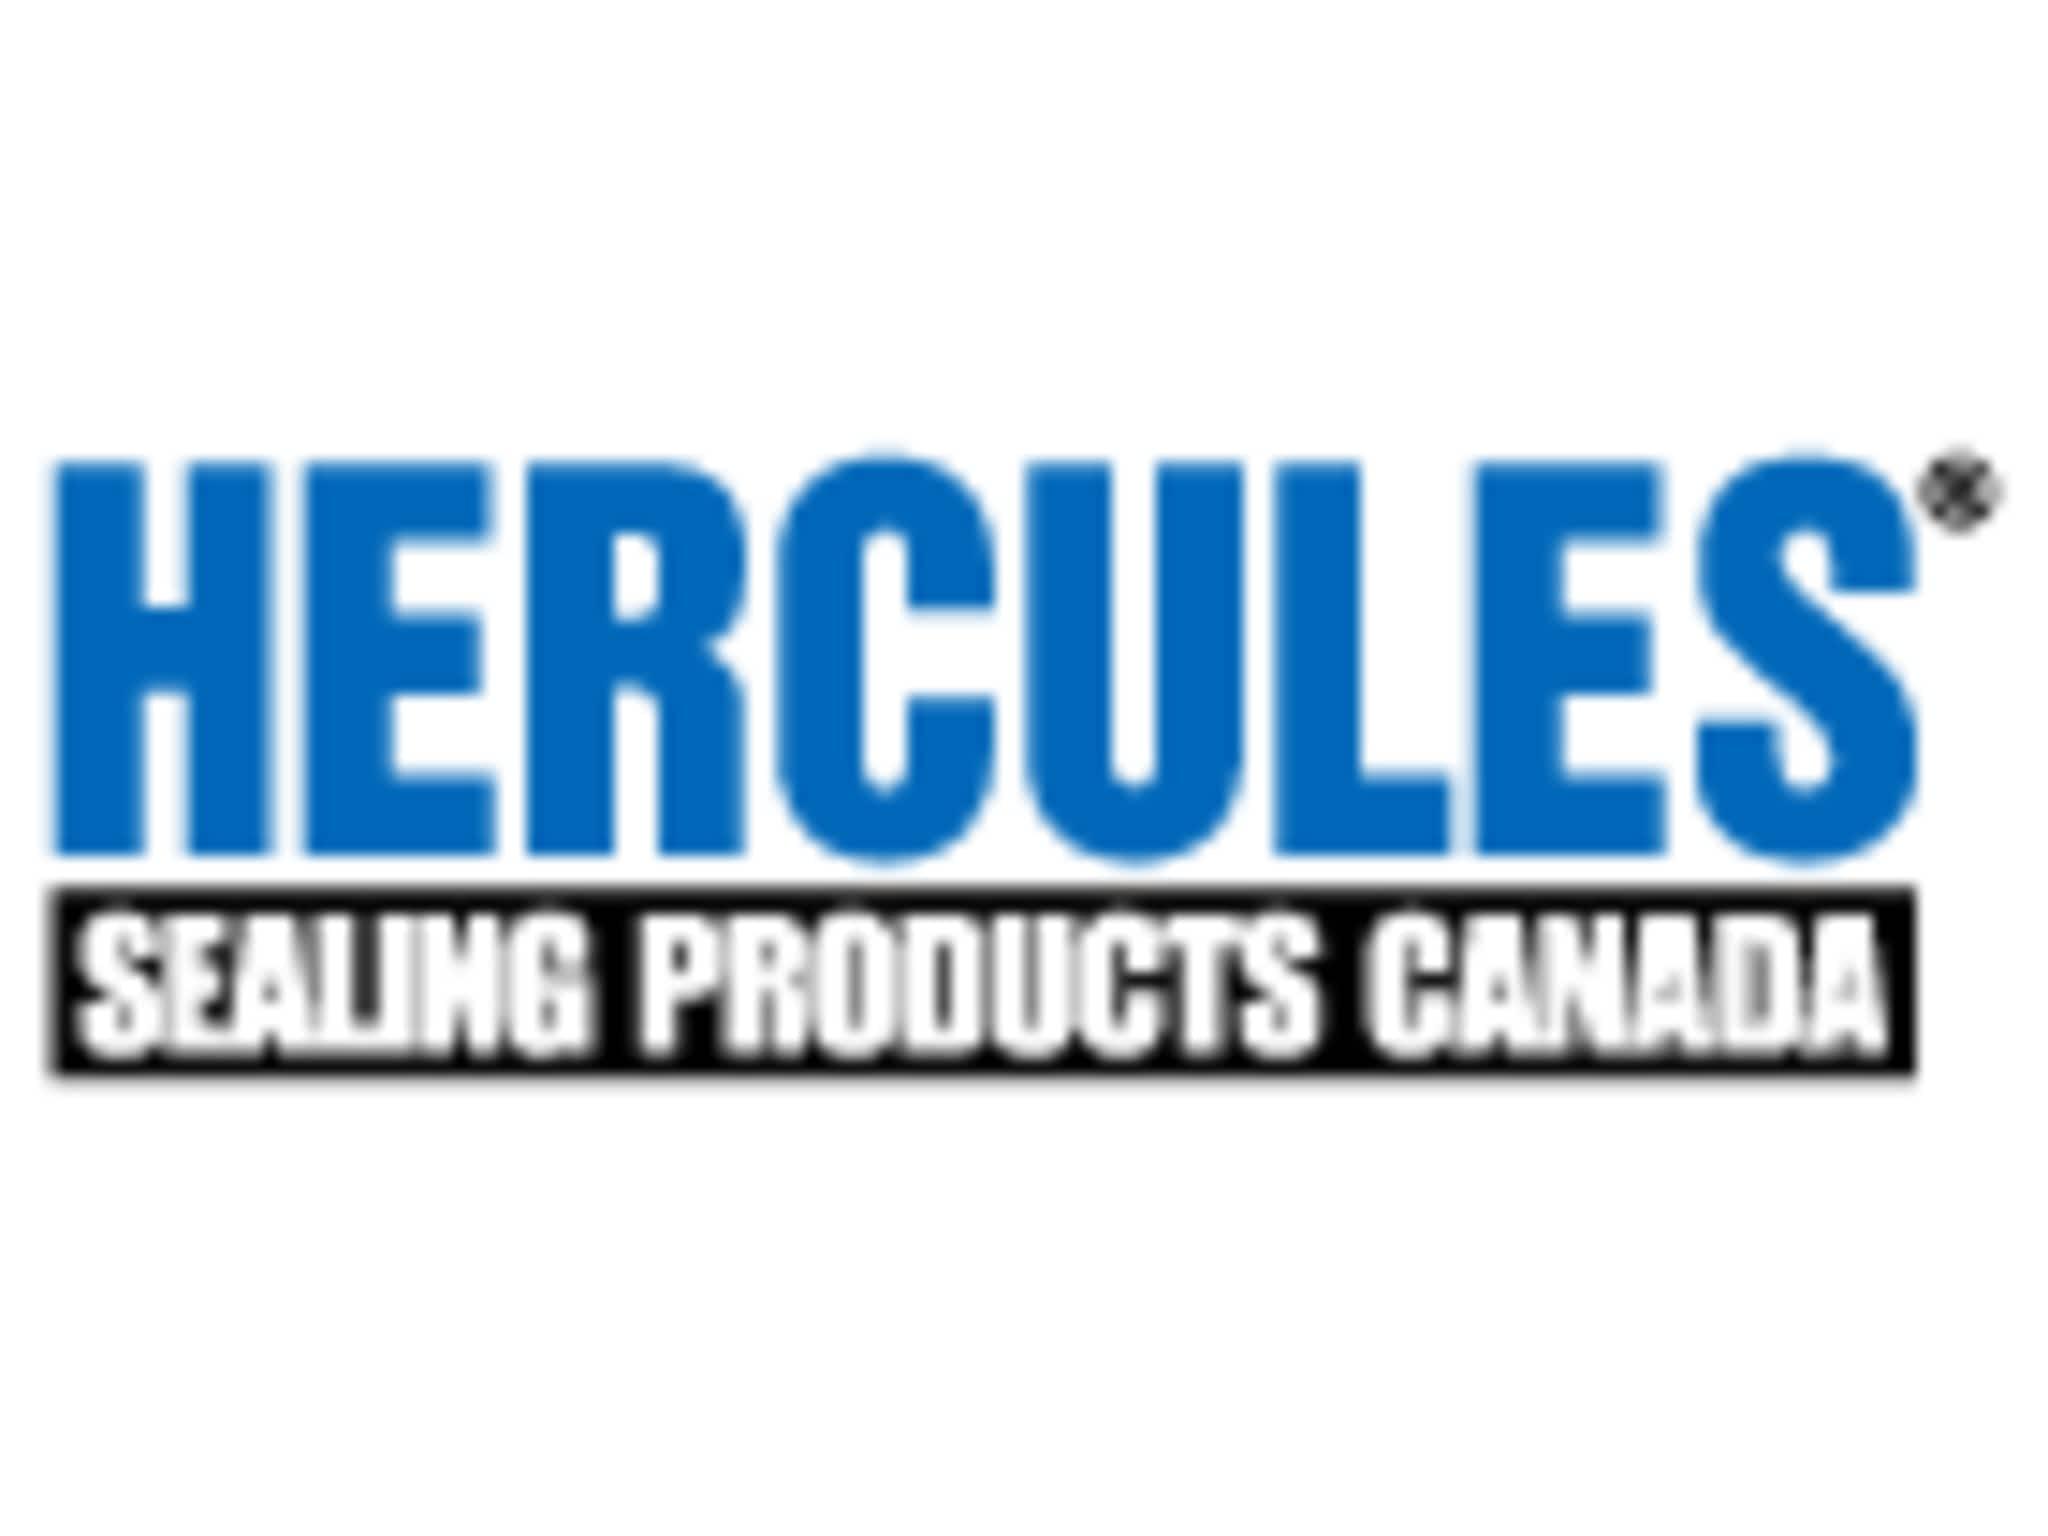 photo Hercules Sealing Products Canada